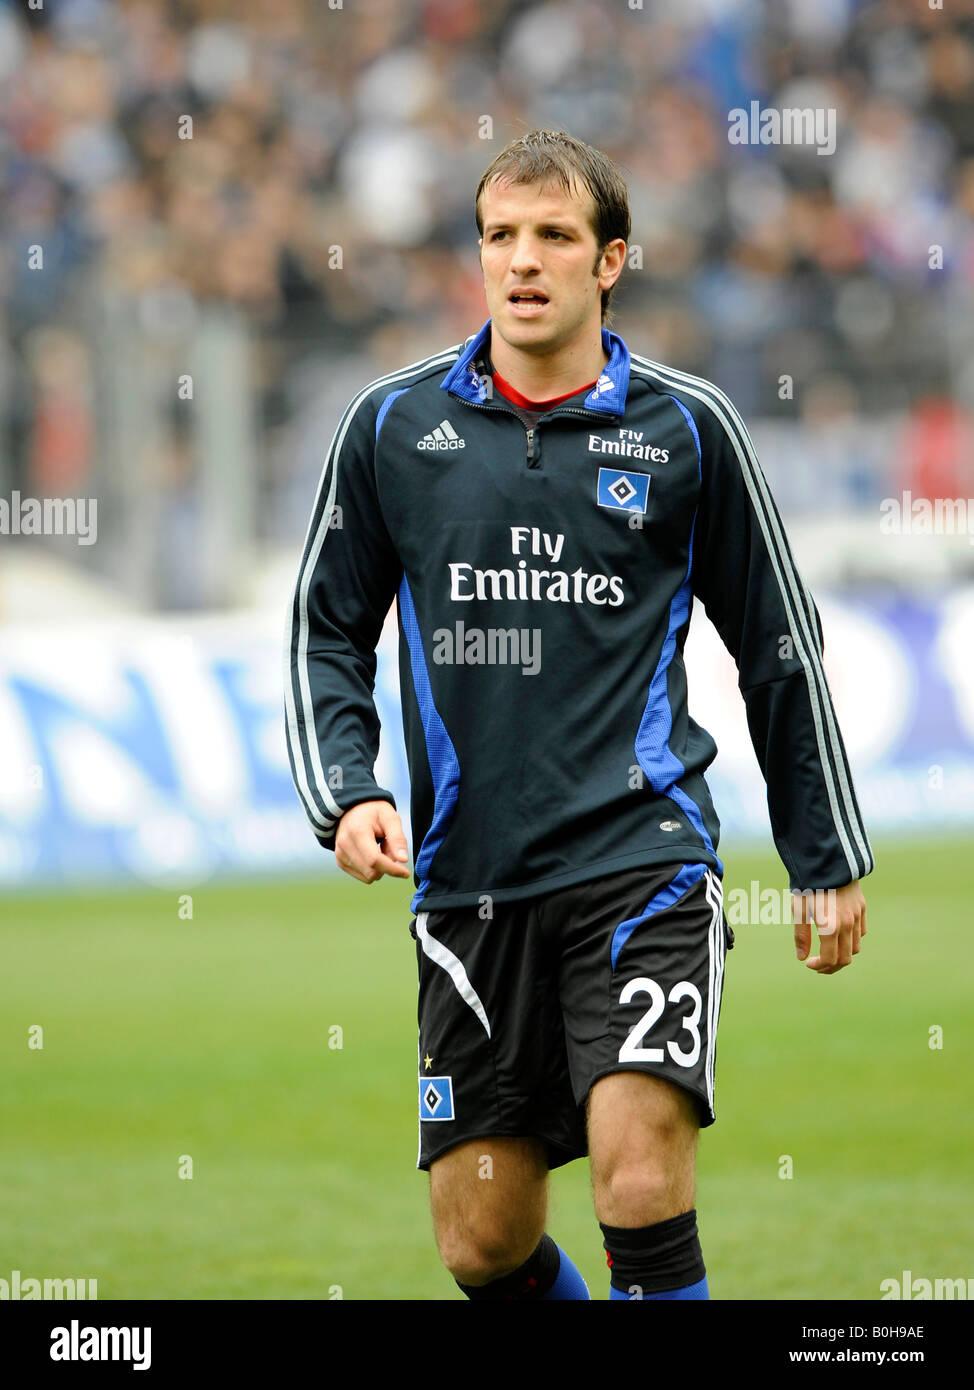 Rafael VAN DER VAART, Hamburger SV footballer - Stock Image